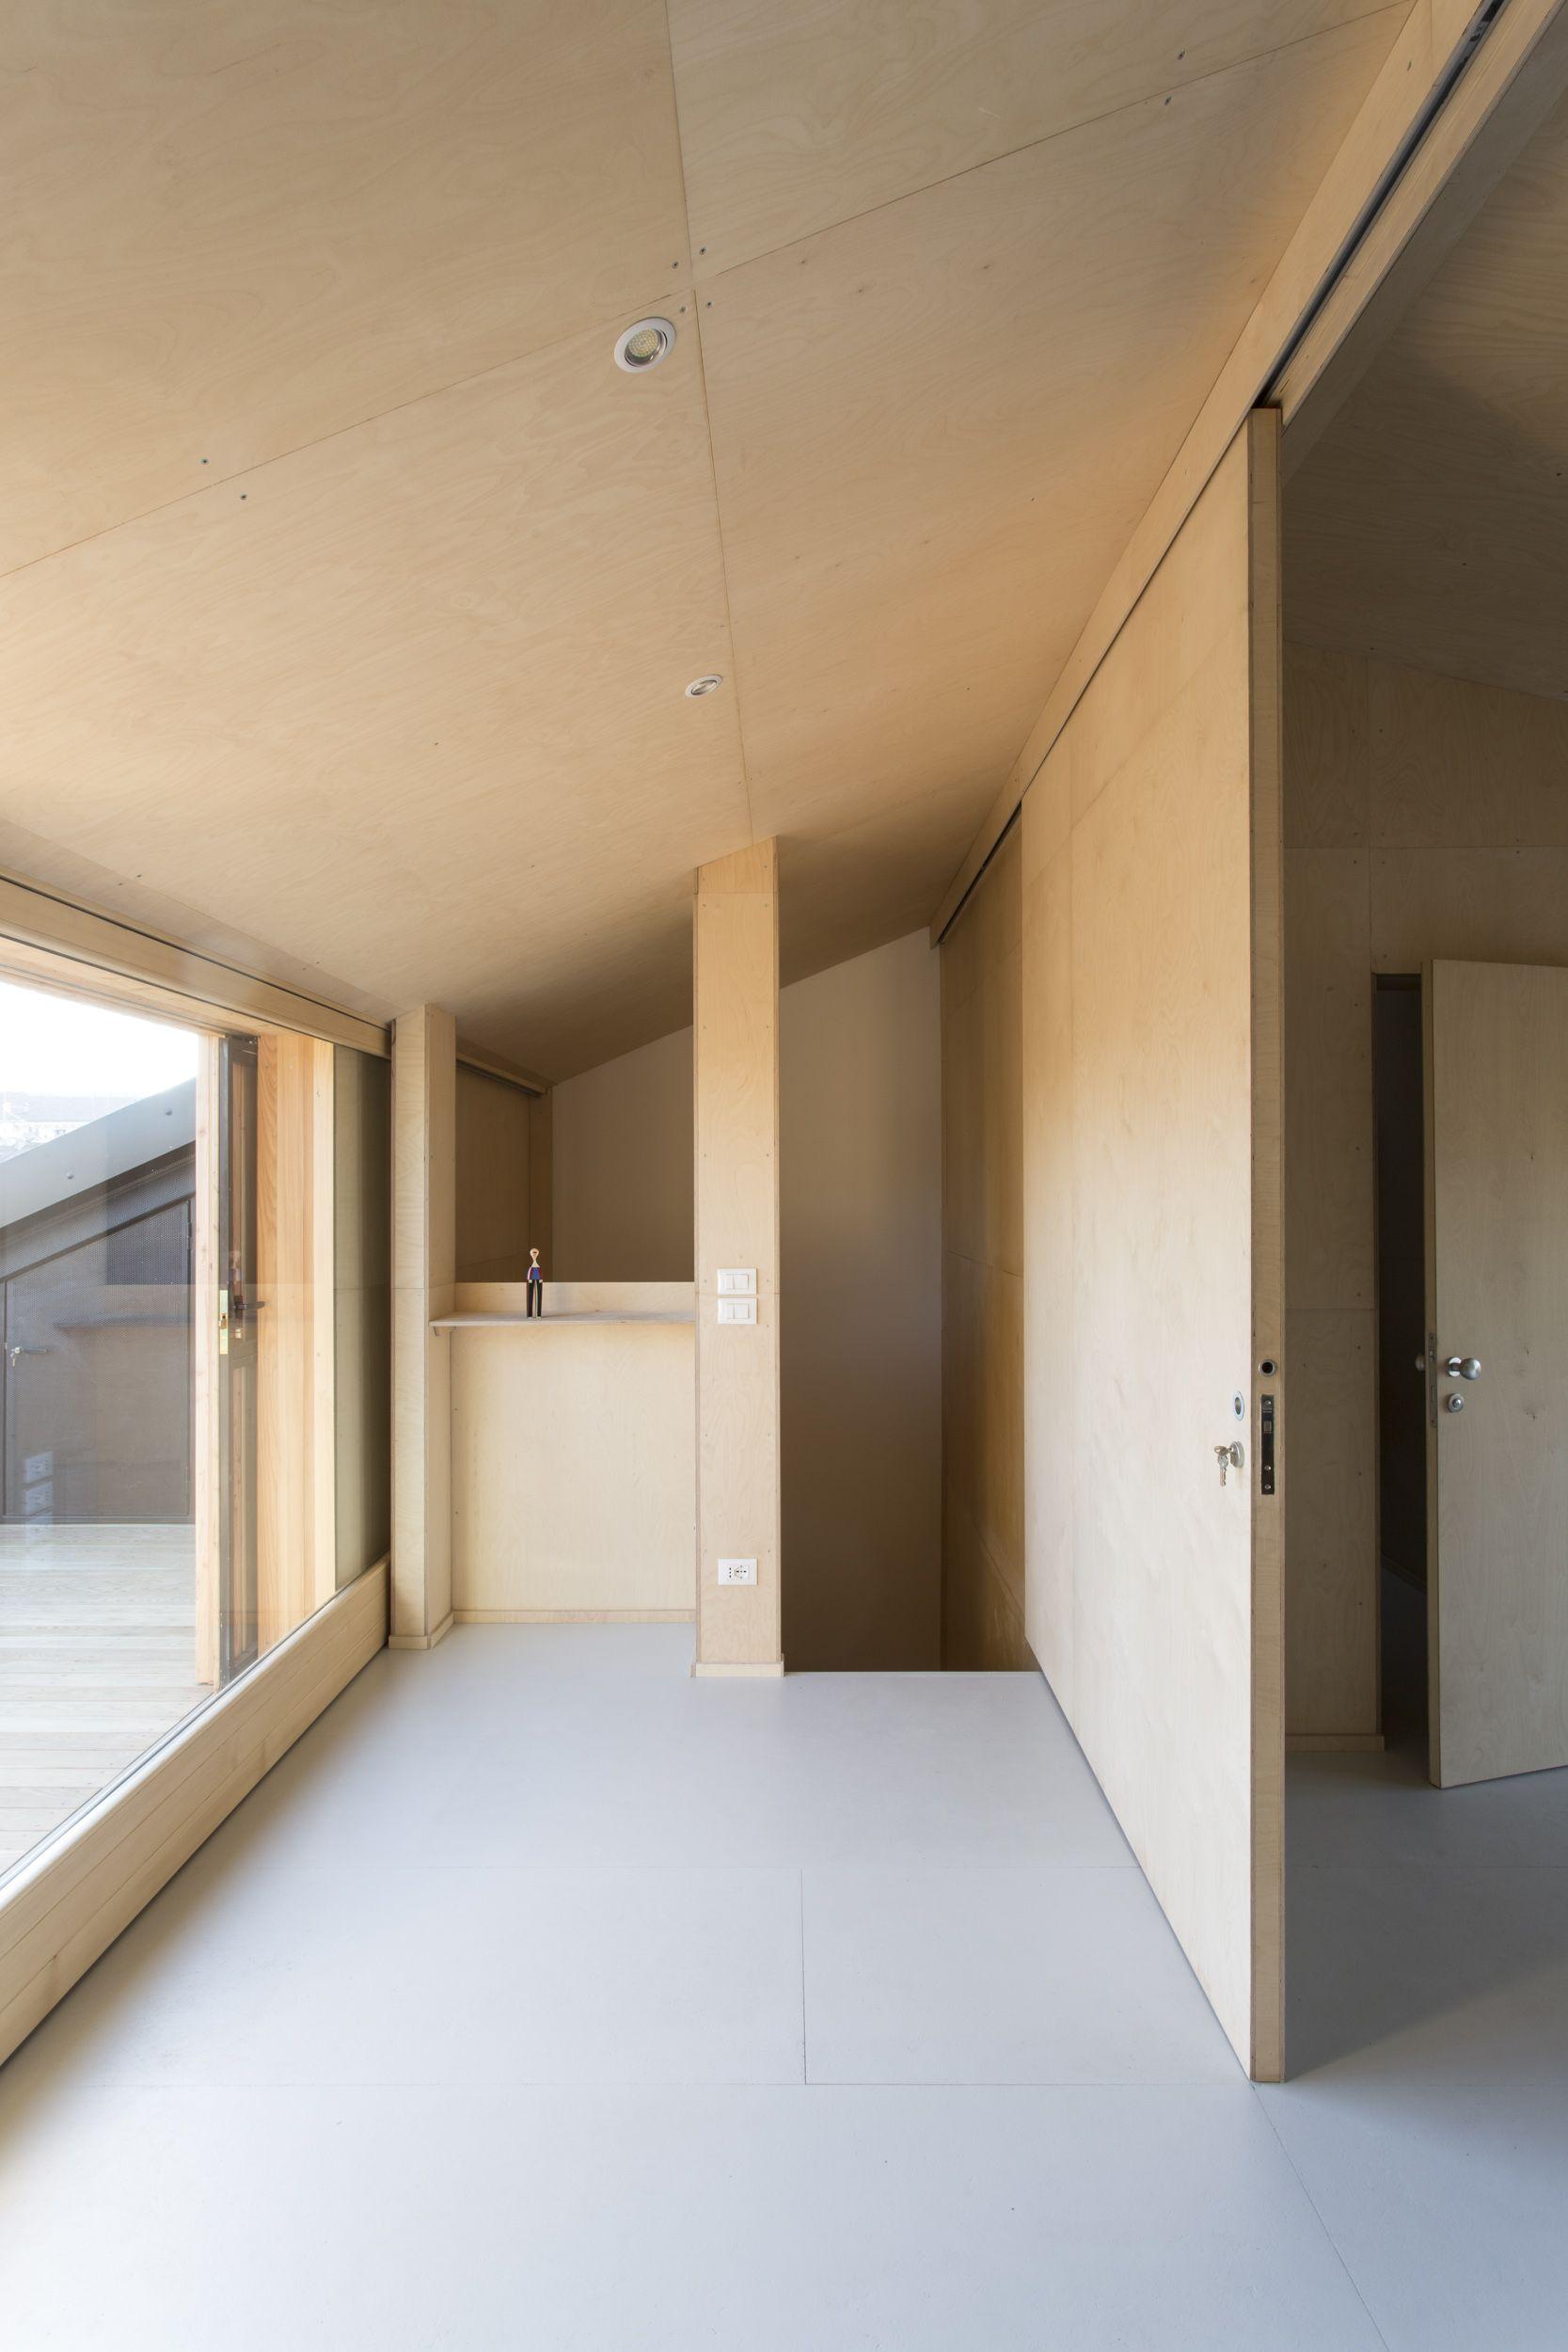 Pin by holger goettler on wohnideen - innen | Pinterest | Rooftop ...